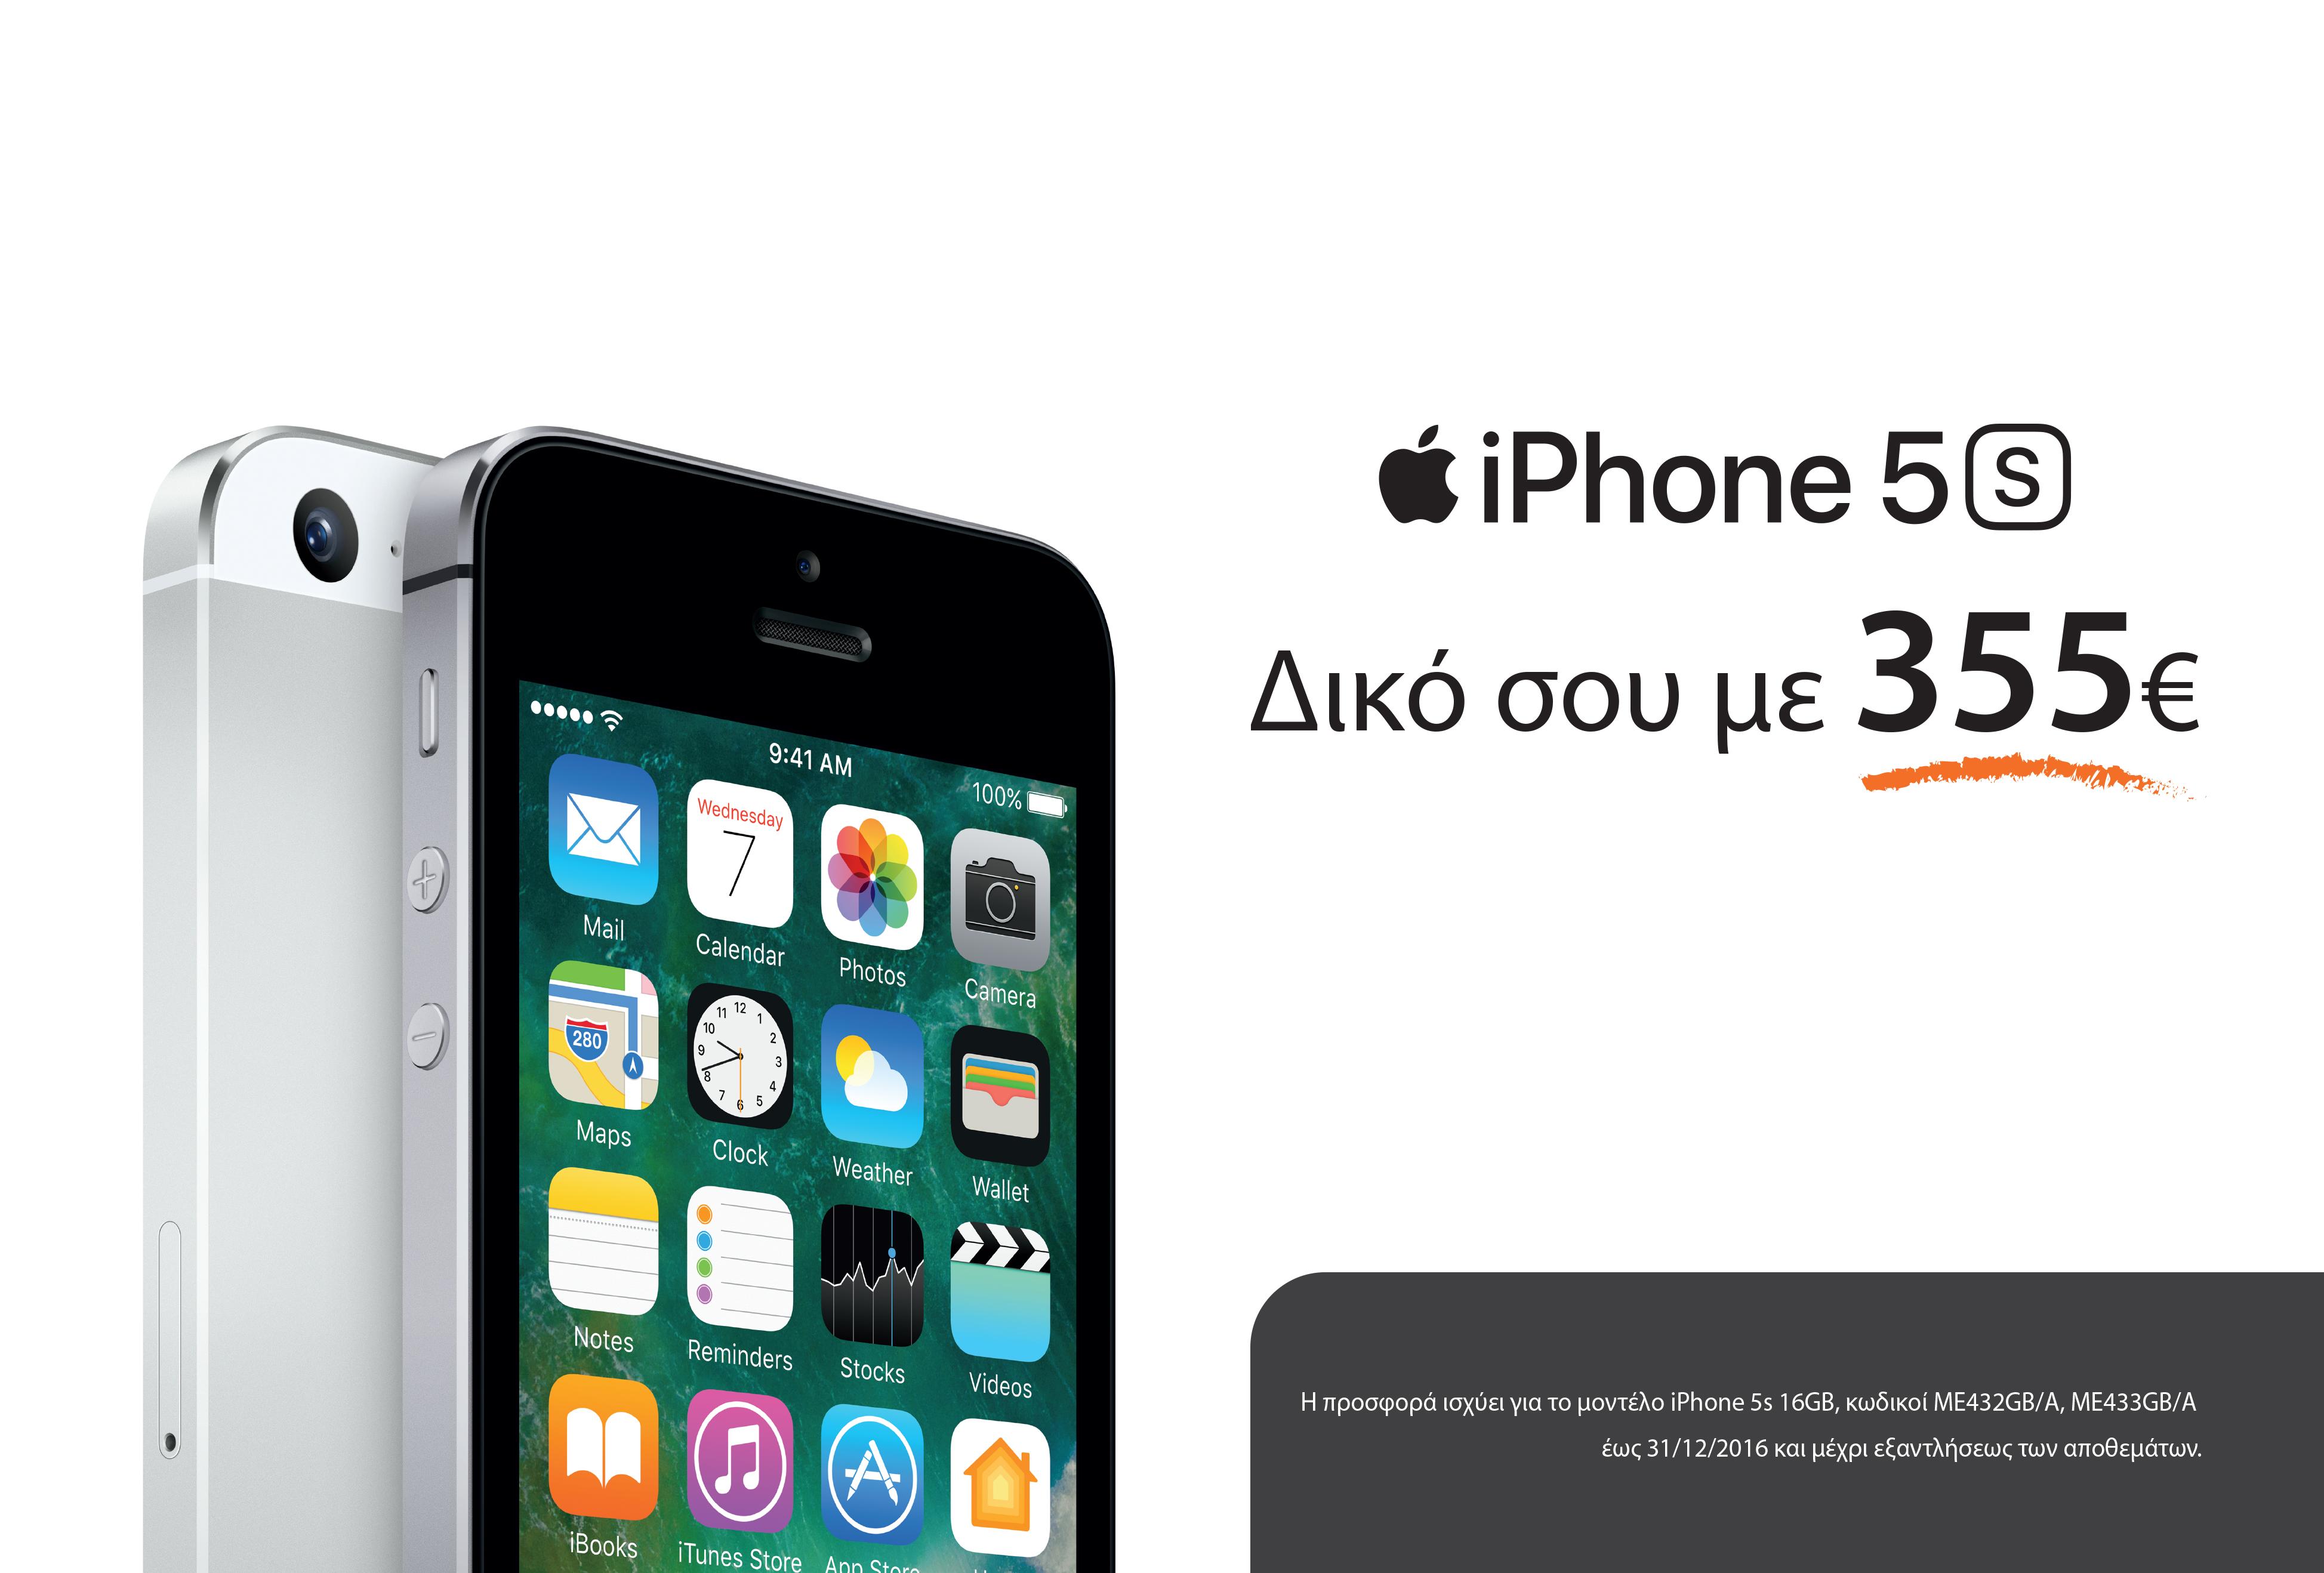 iPhone 5s με 355€